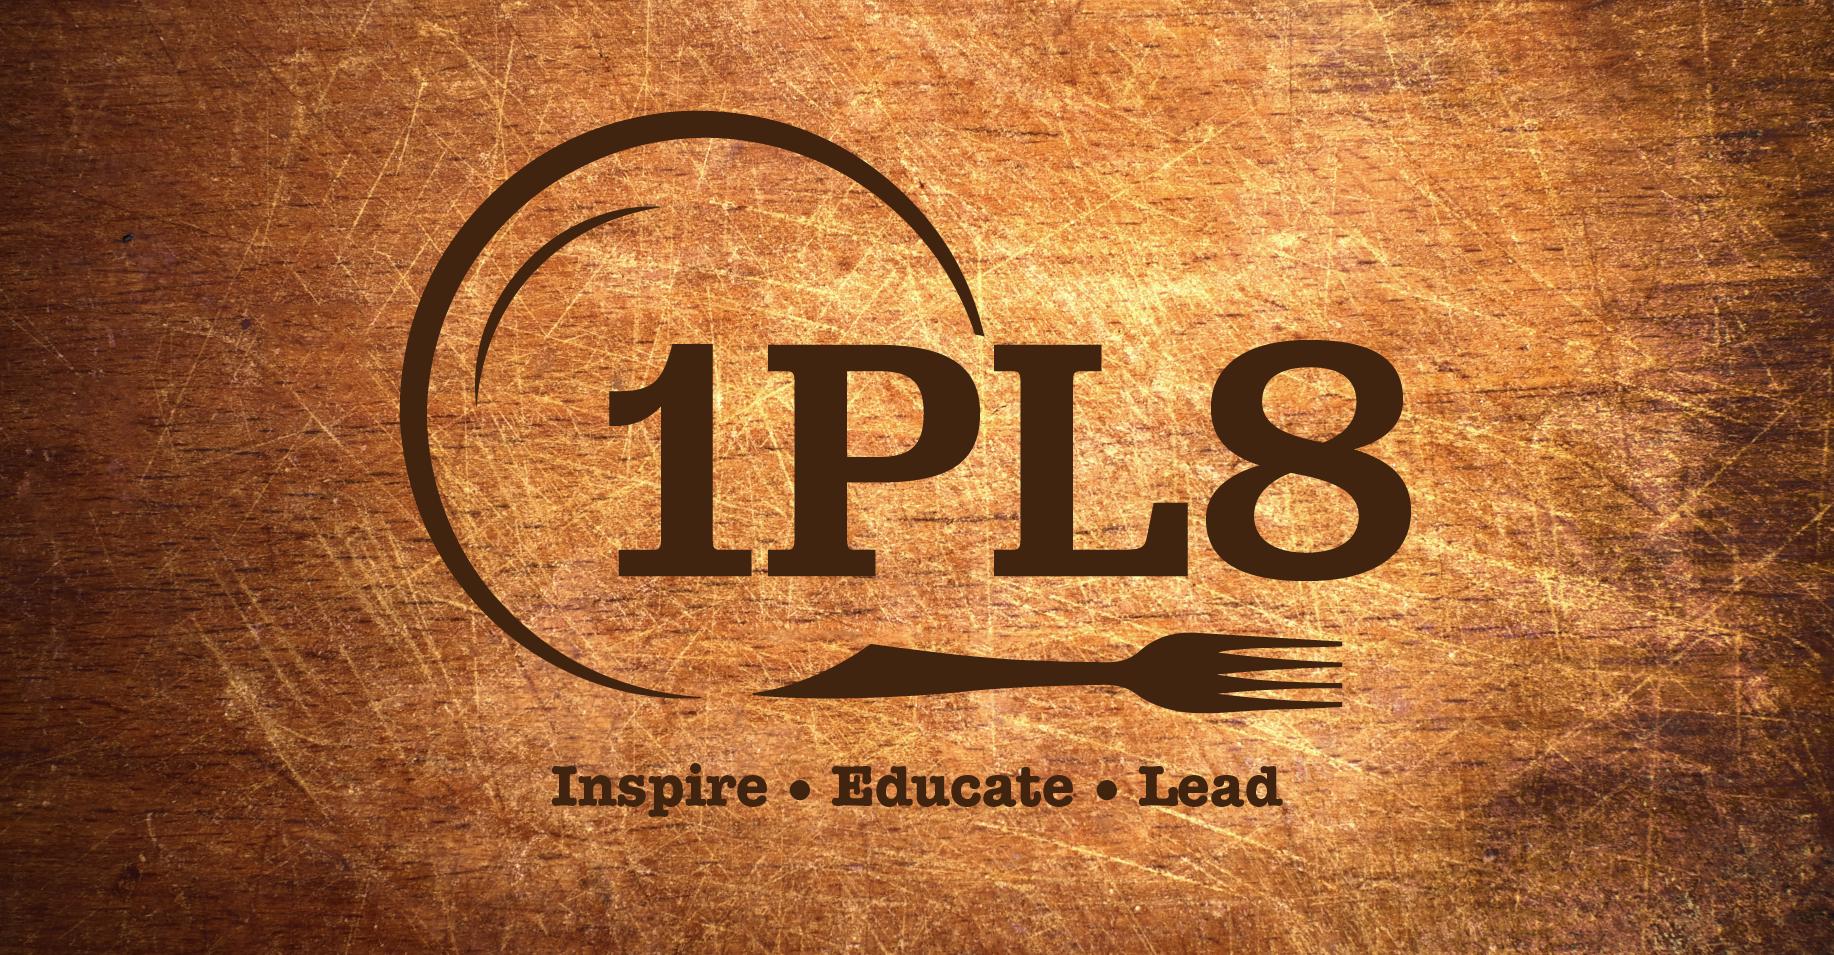 1pl8 Logo